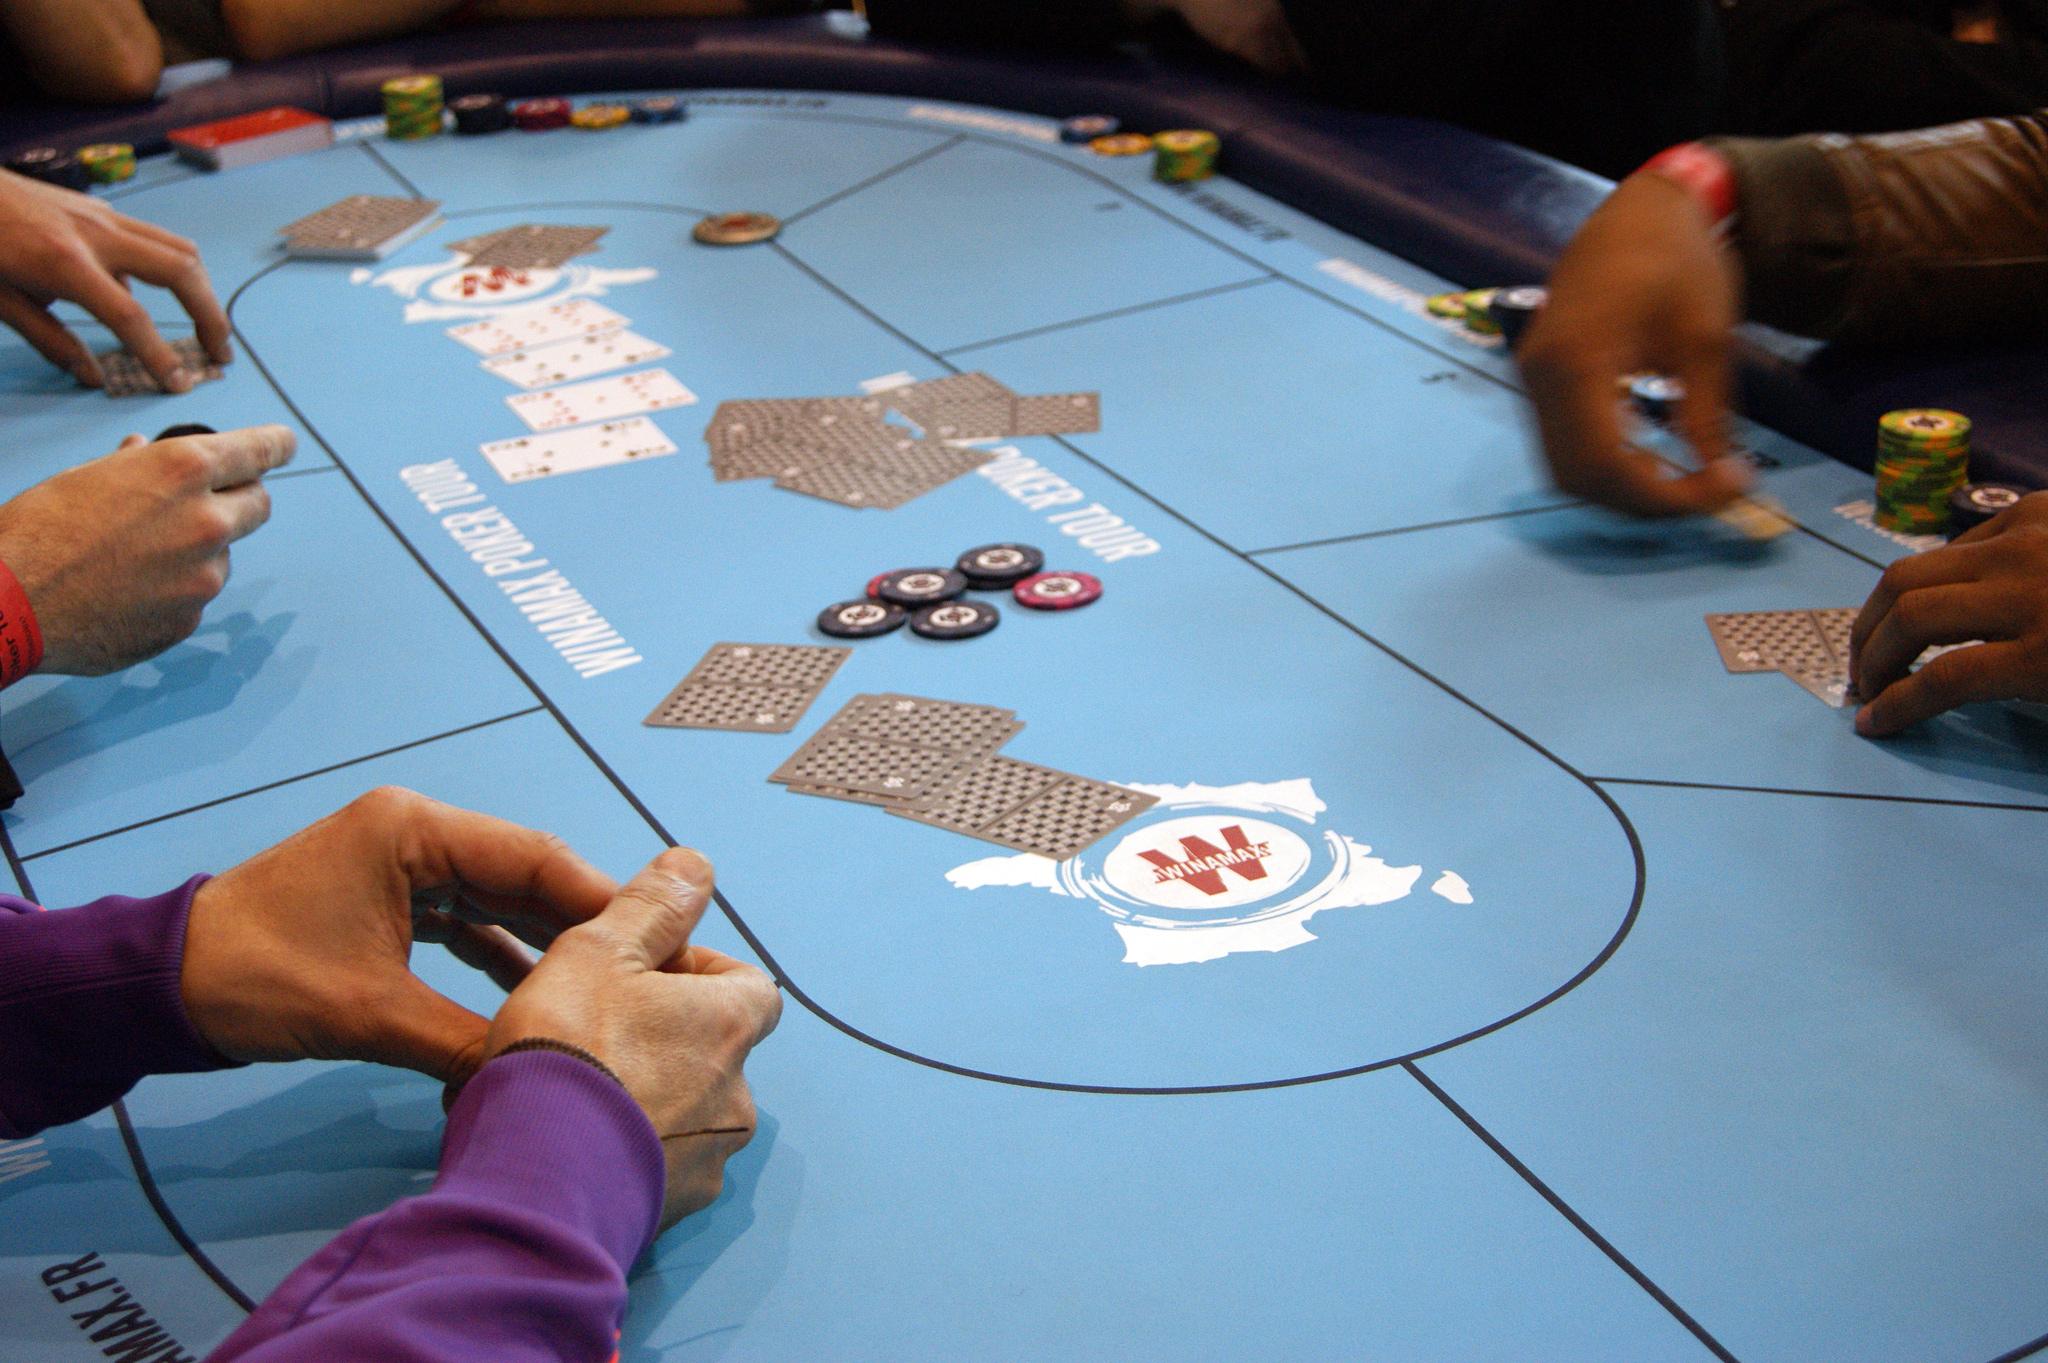 Maryo S Bazaar Winamax 22 Poker Tour Web